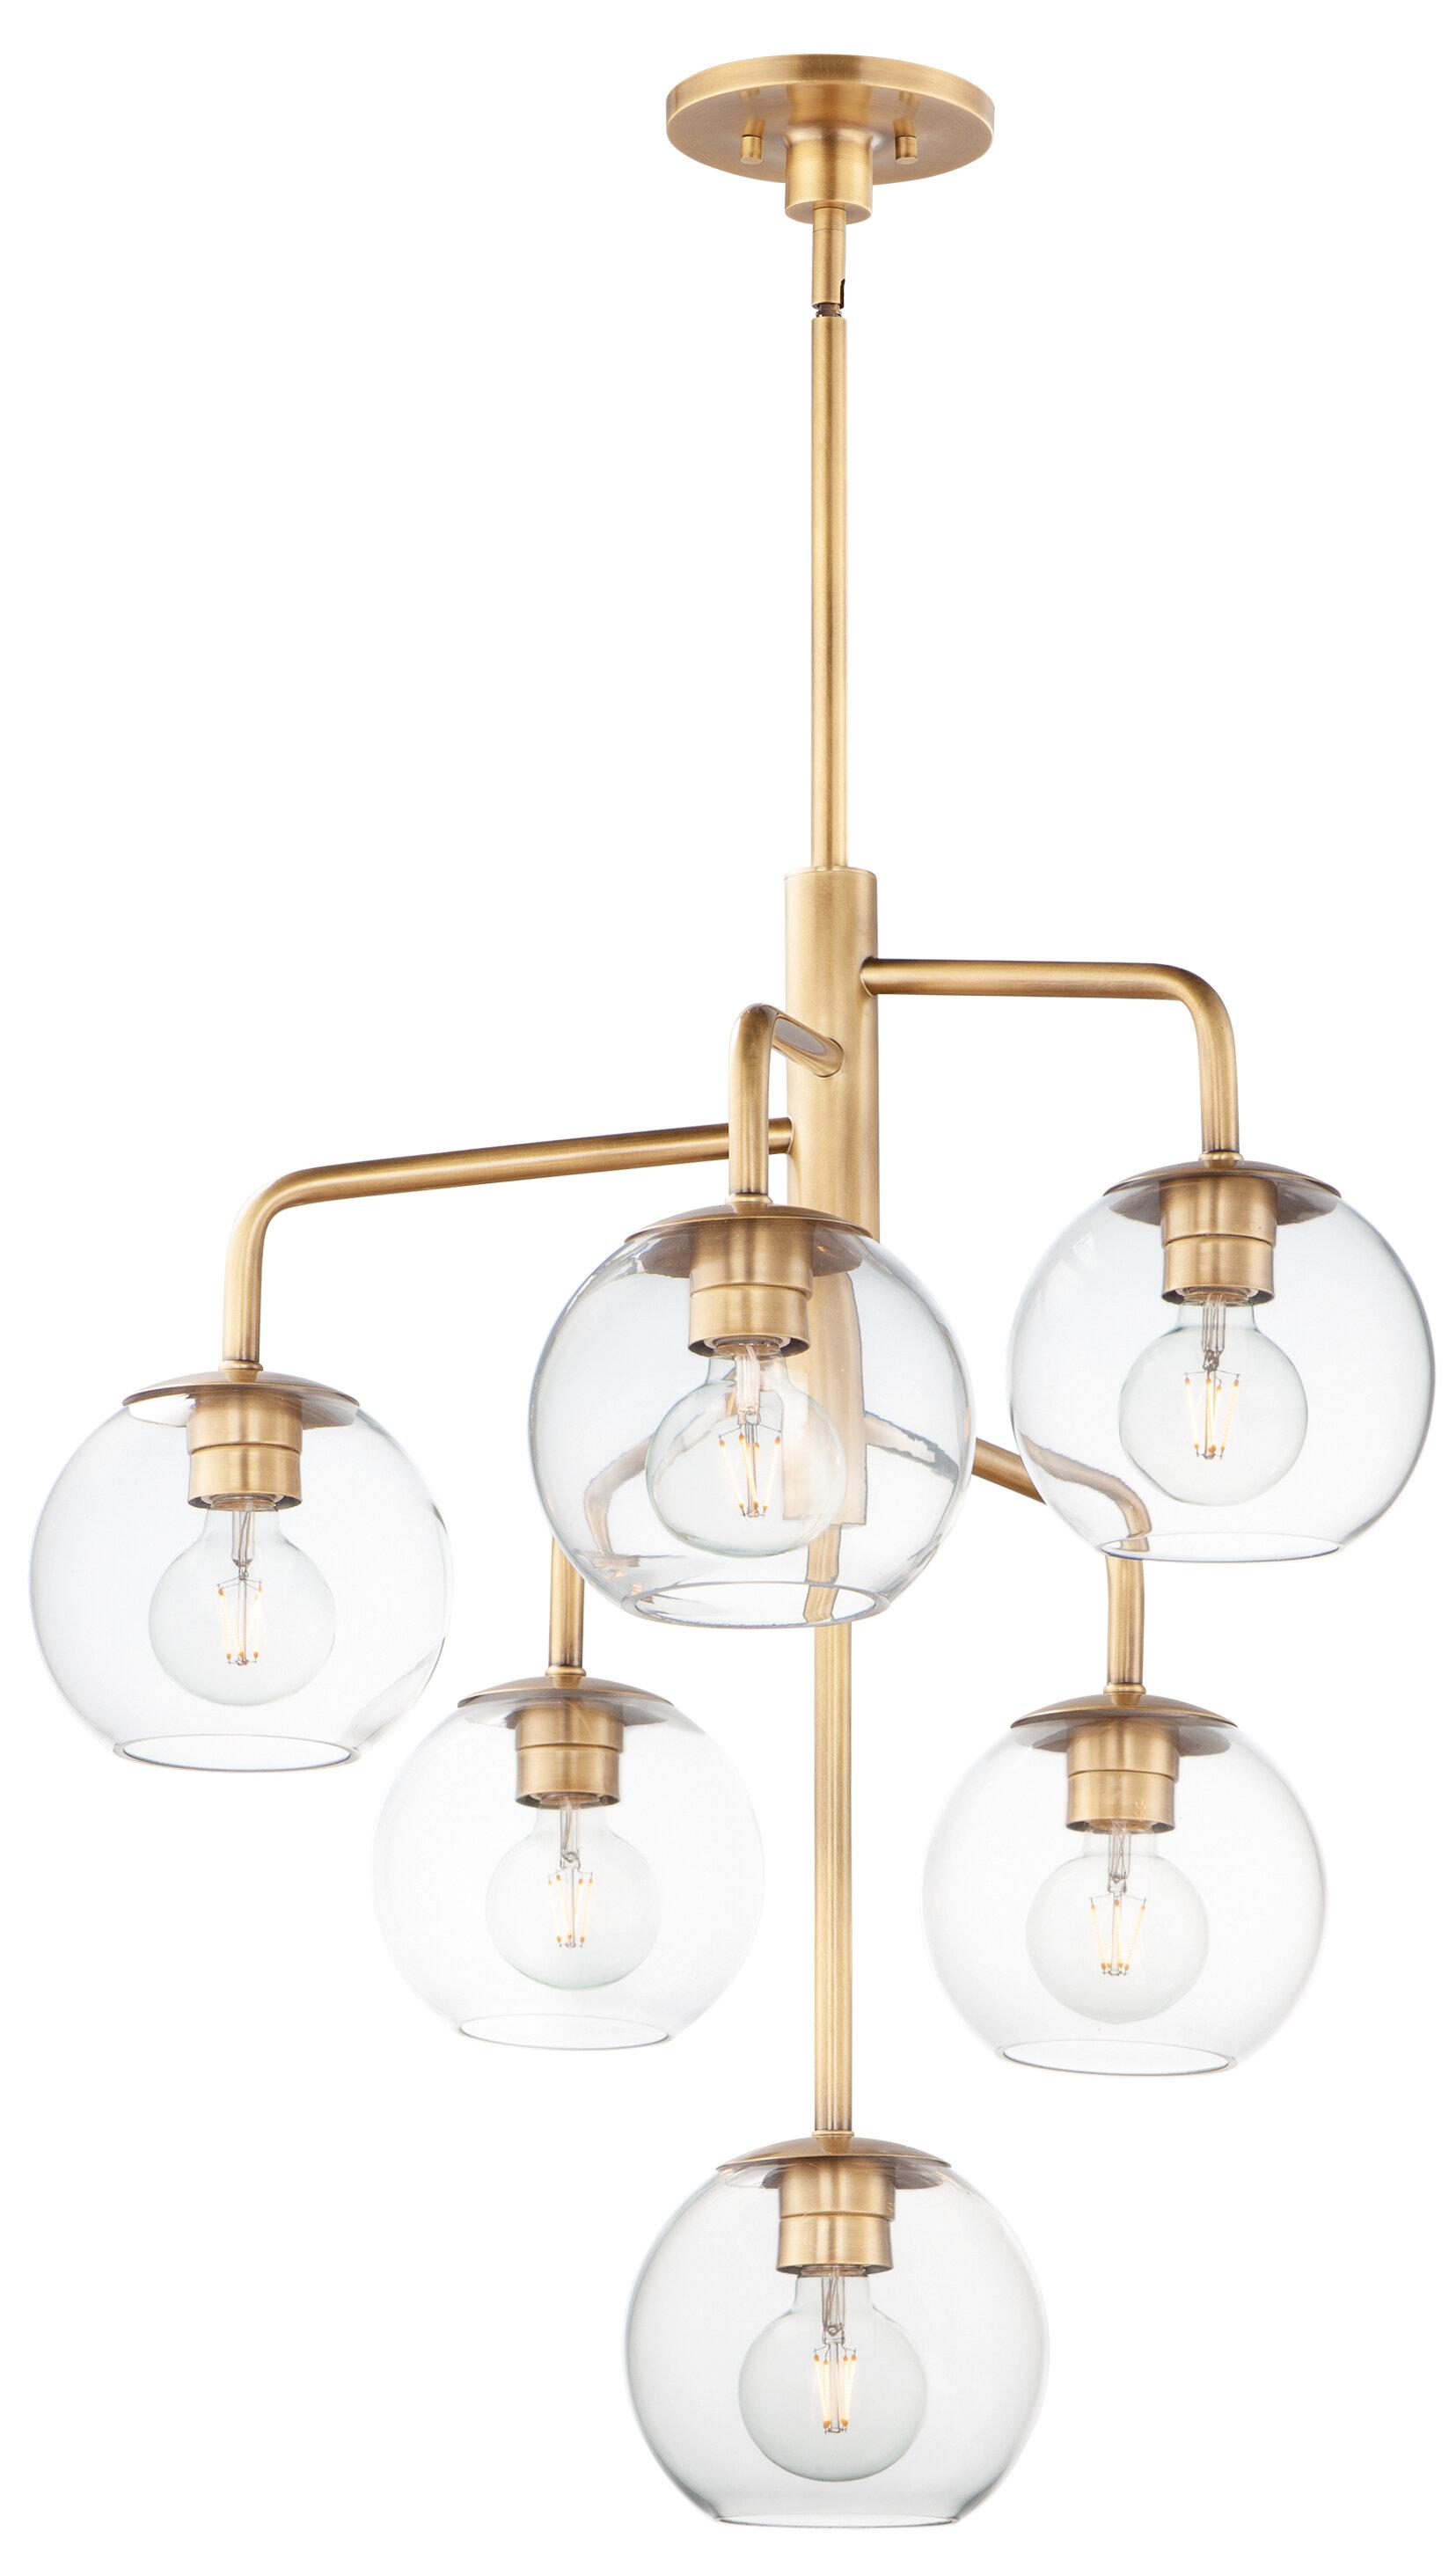 6 Light Shaded Modern Linear Chandelier